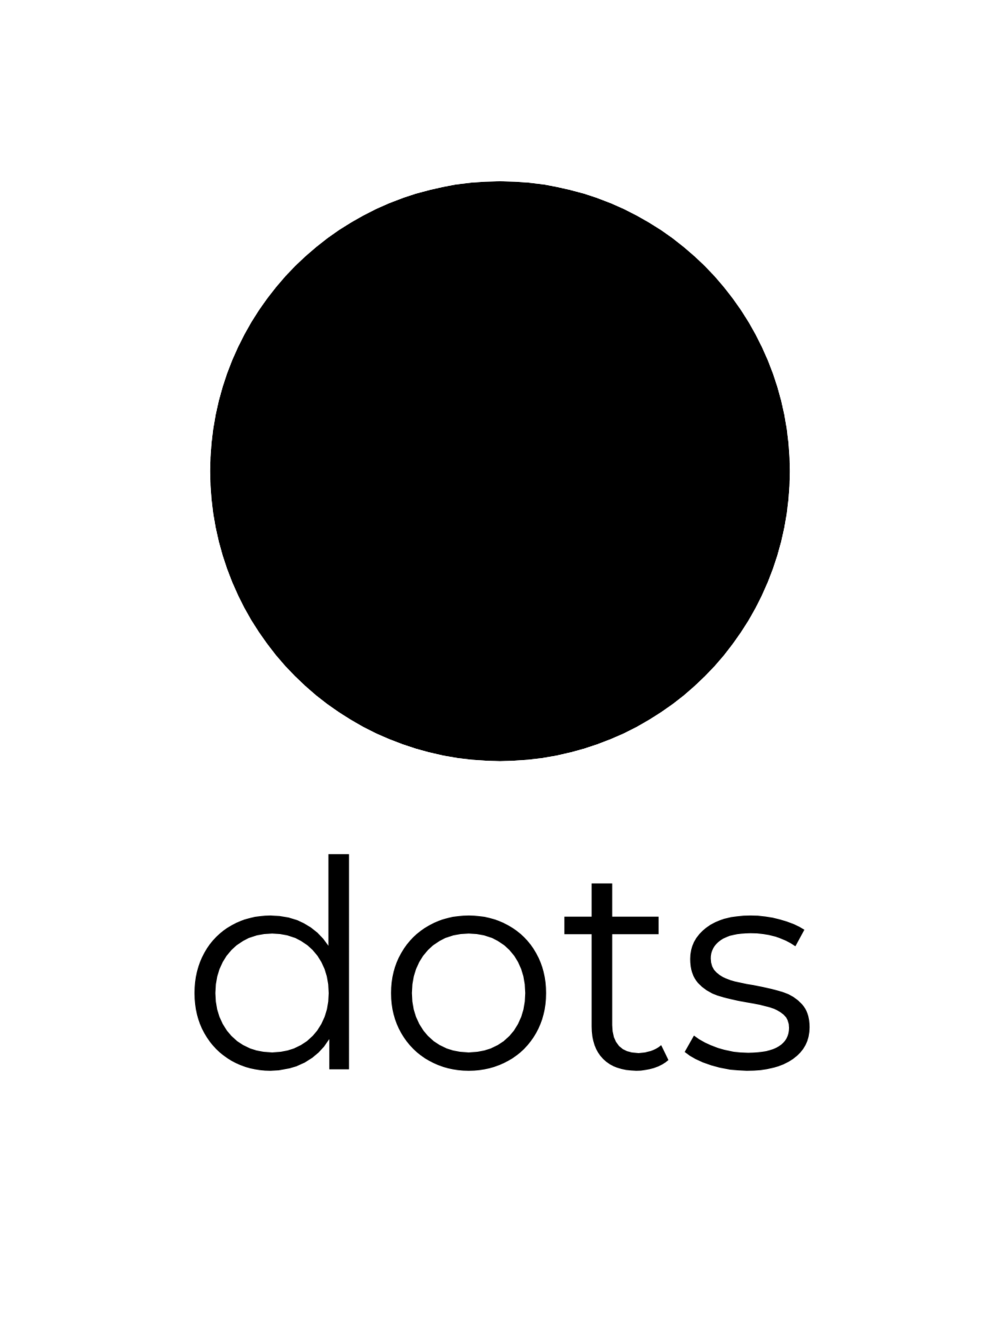 dots-logo-black (1).png